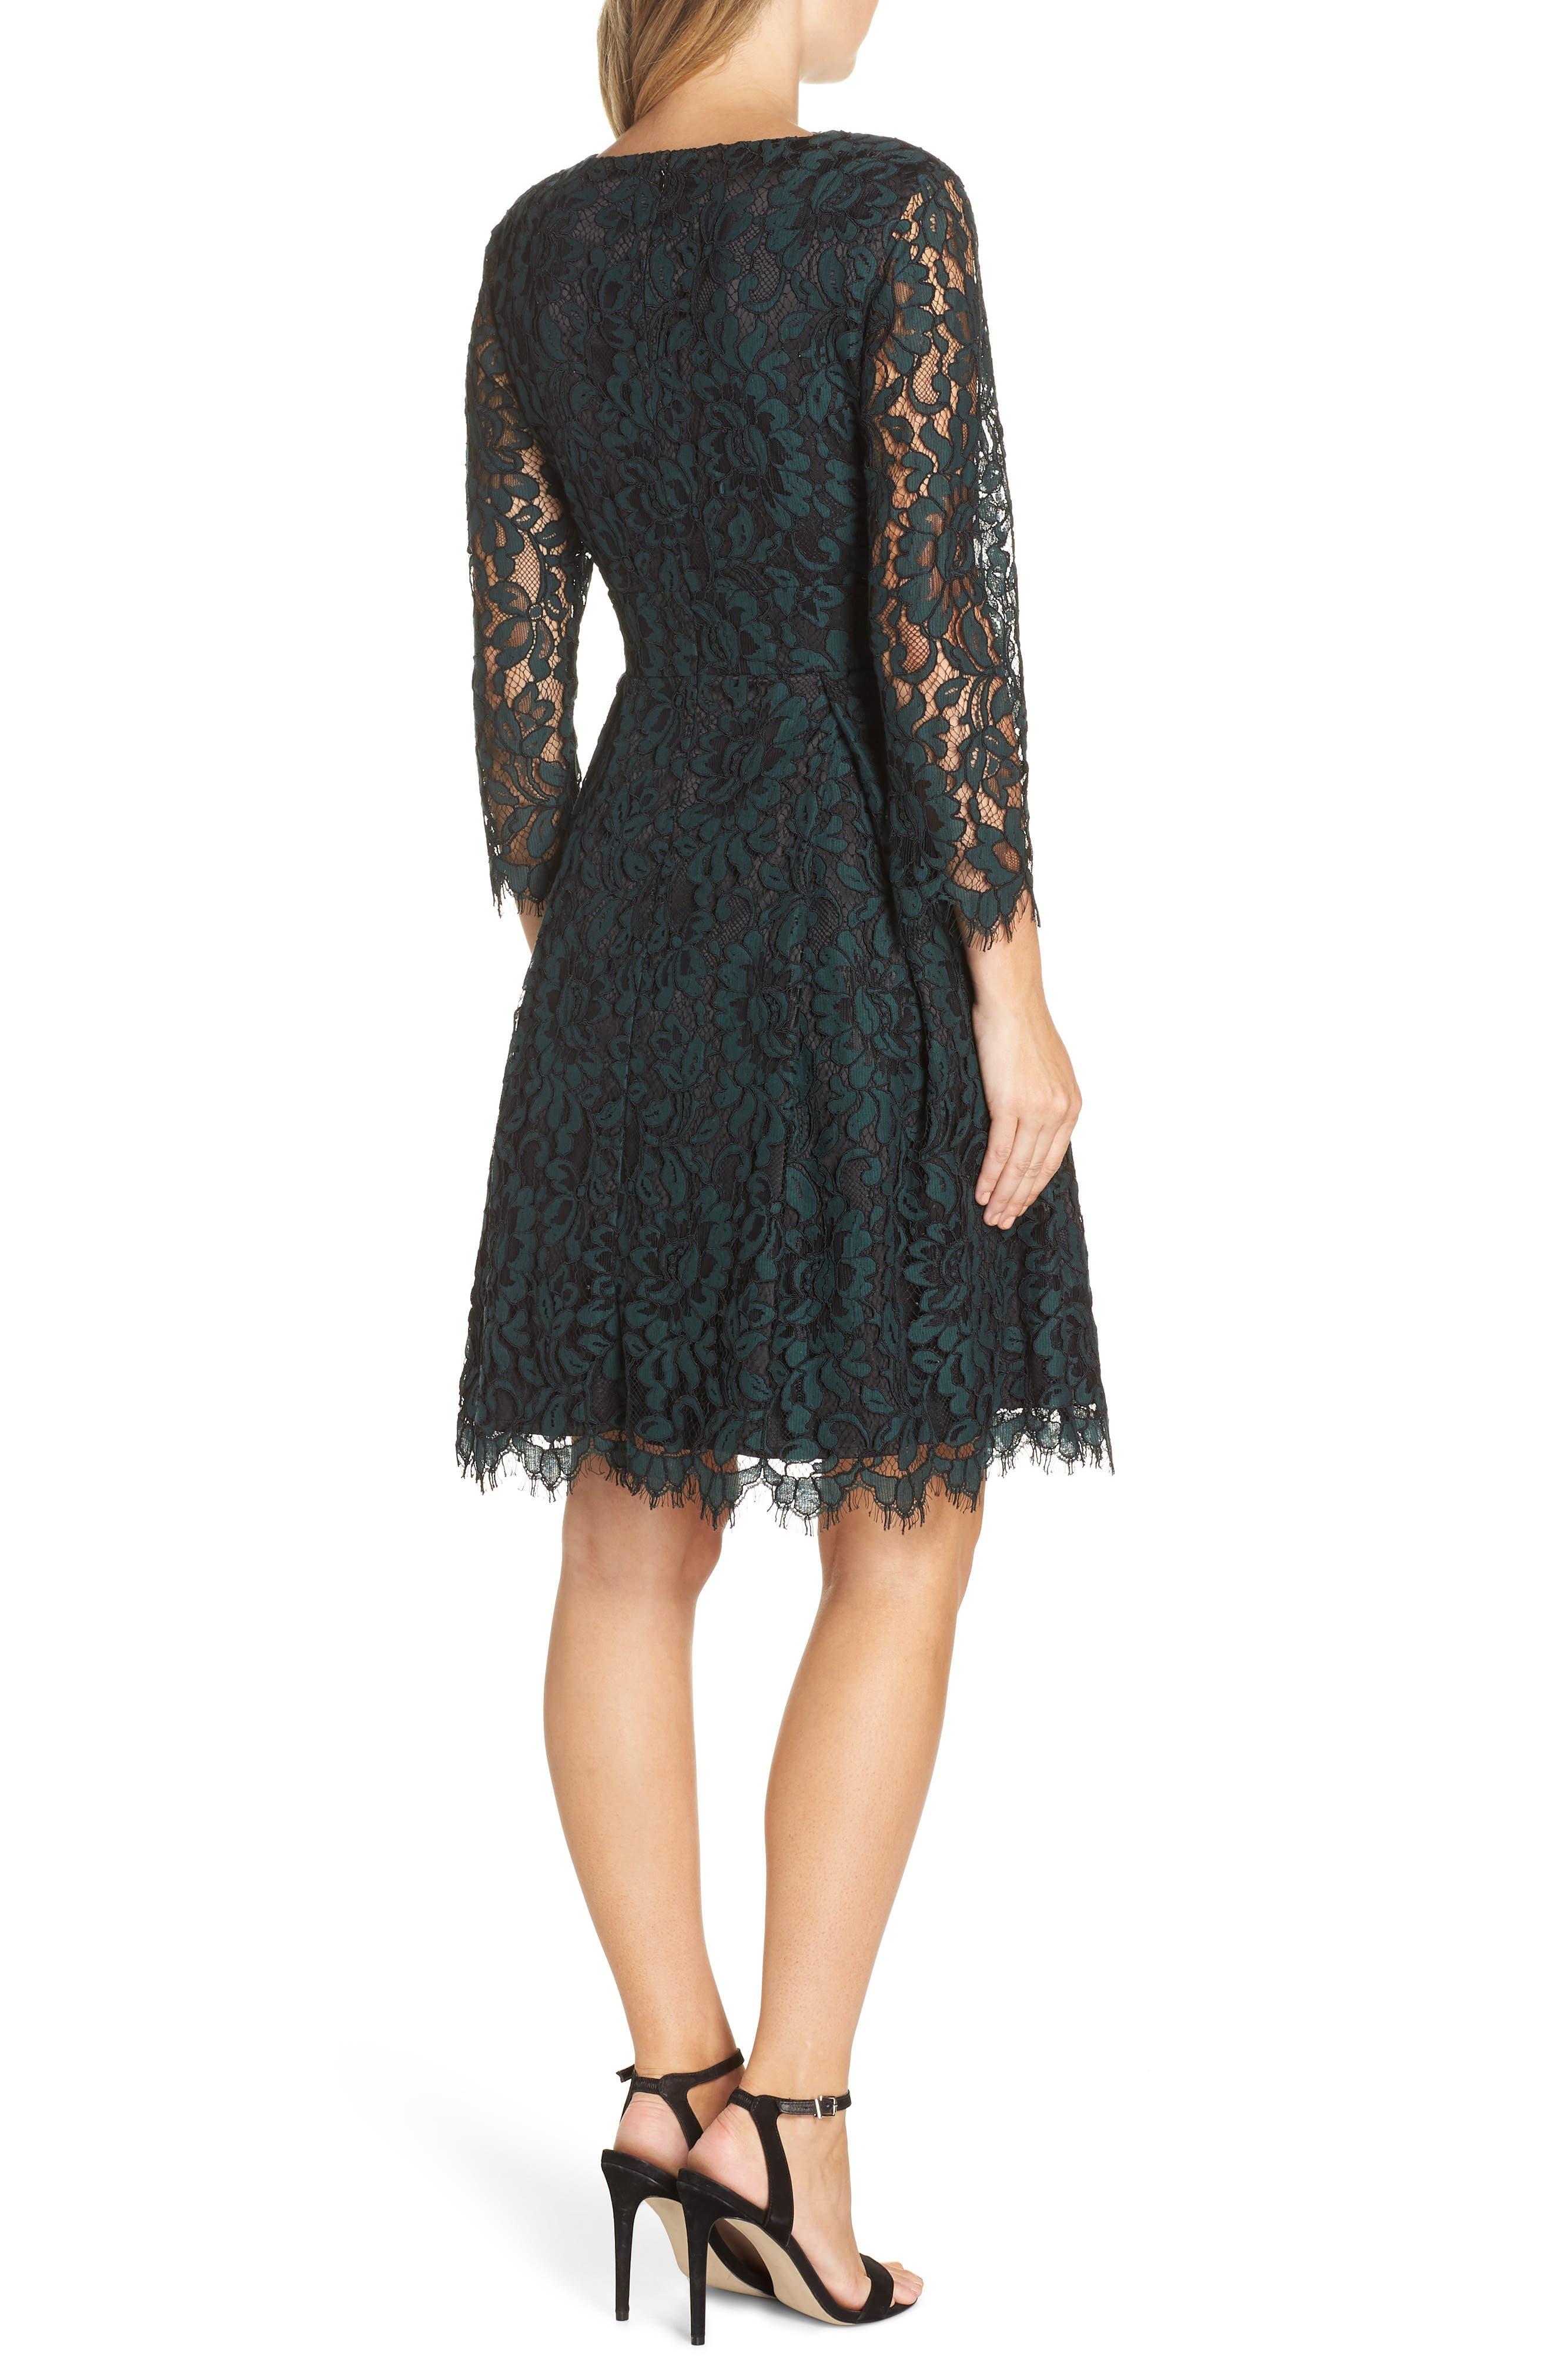 ELIZA J, Lace V-Neck Fit & Flare Dress, Alternate thumbnail 2, color, 310